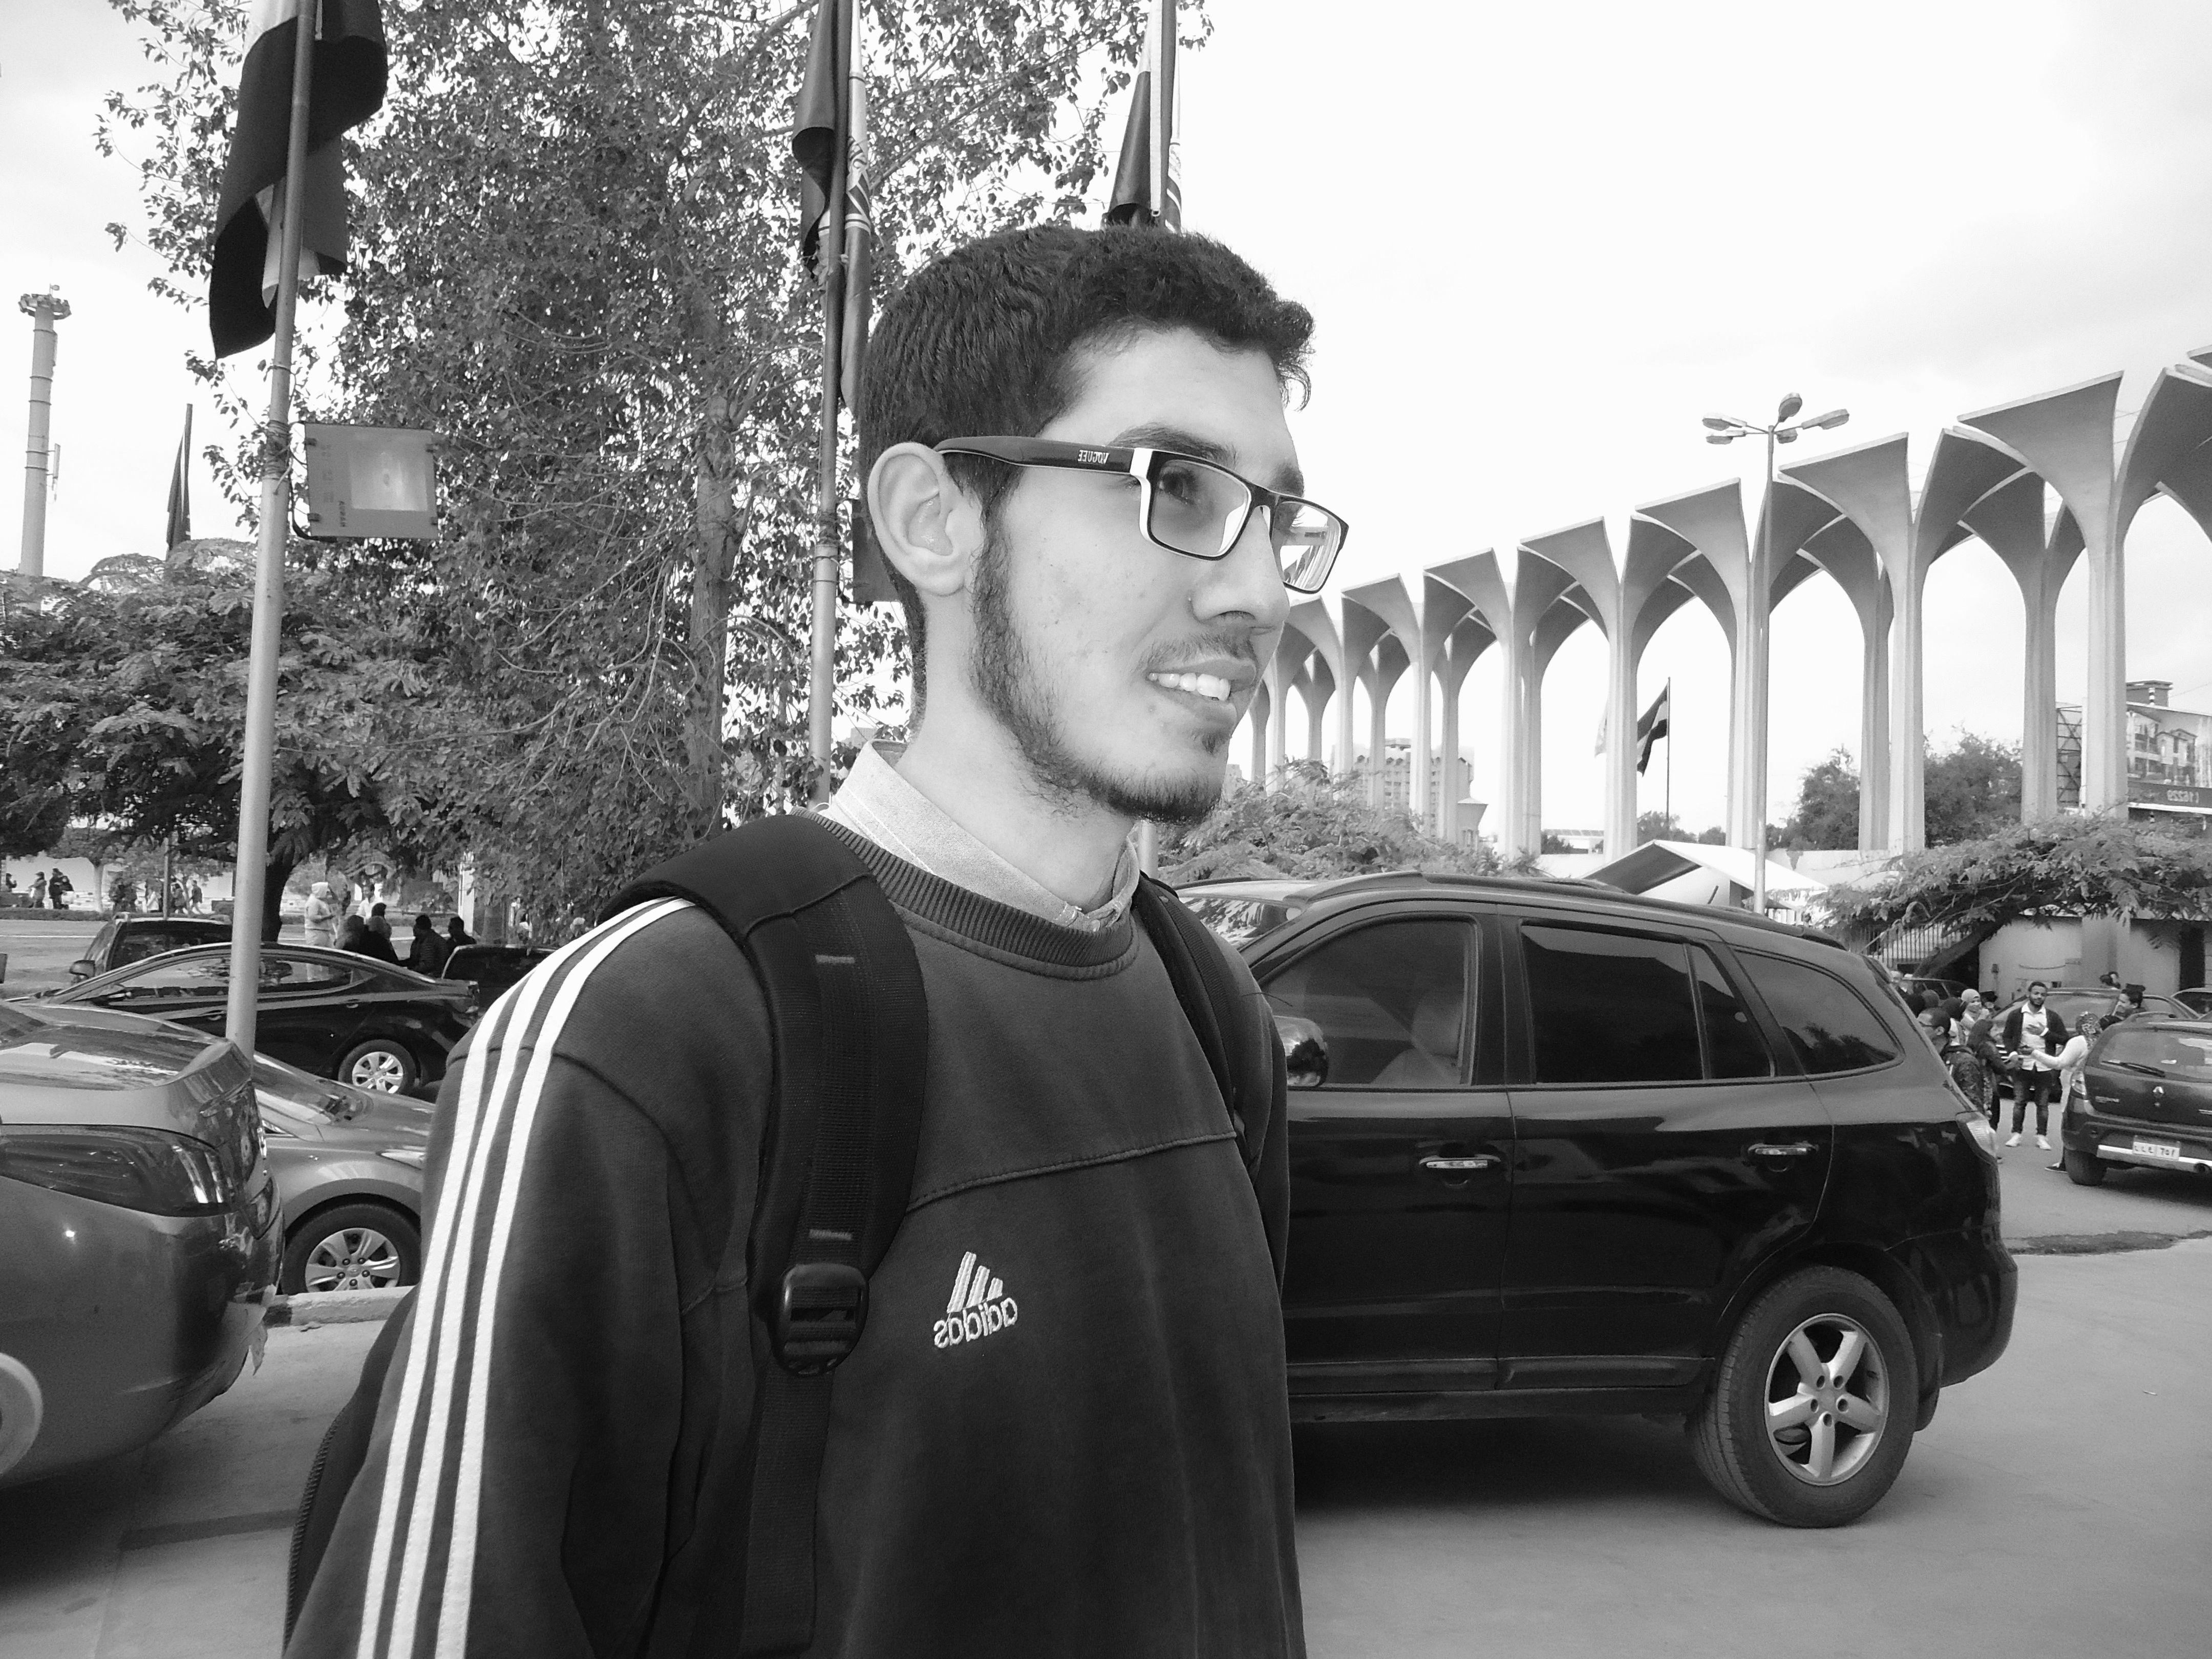 حسام رمضان أمين  Headshot